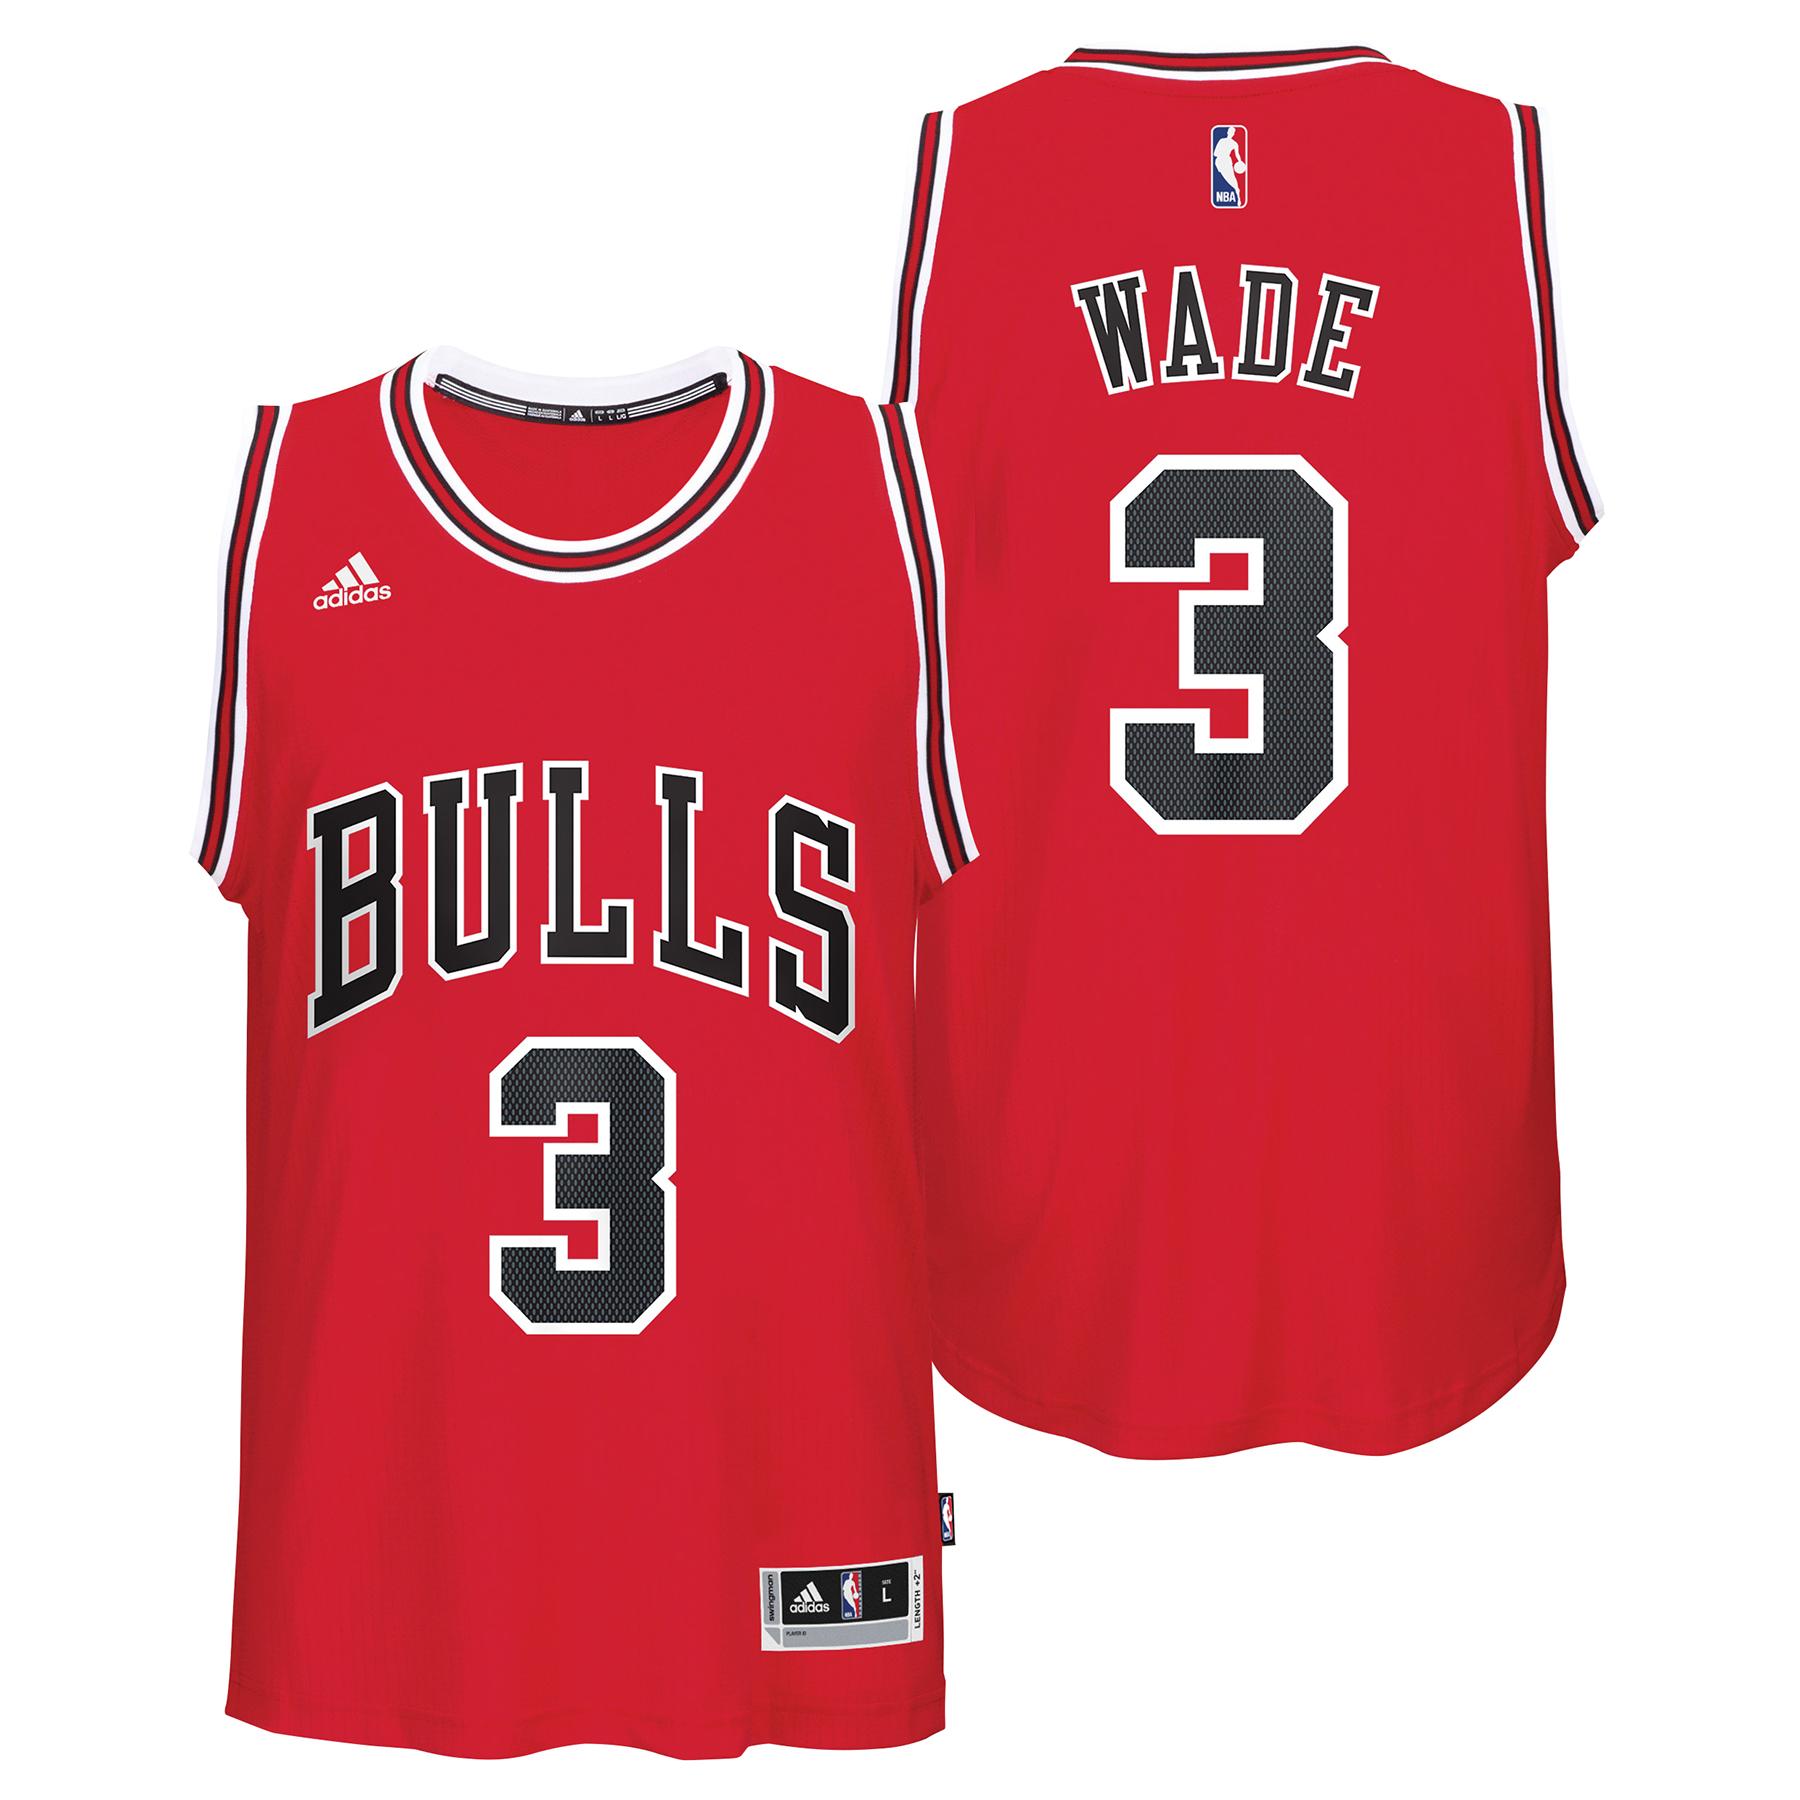 Chicago Bulls Road Swingman Jersey - Dwyane Wade - Mens